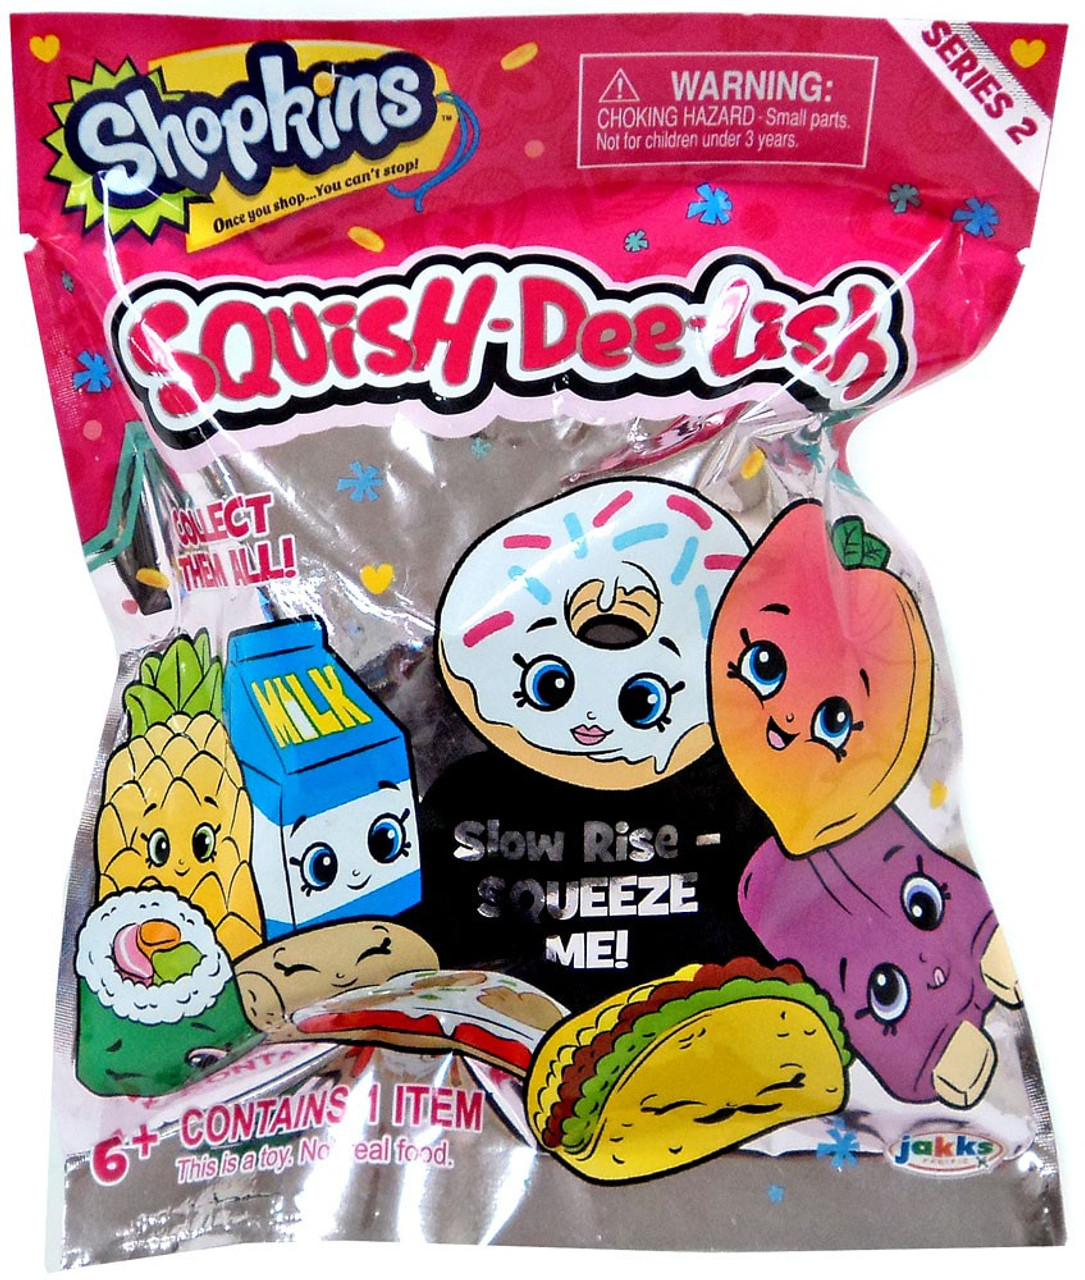 Squish Dee Lish Collection : Squish-Dee-Lish Shopkins Series 2 Mystery Pack Jakks Pacific - ToyWiz